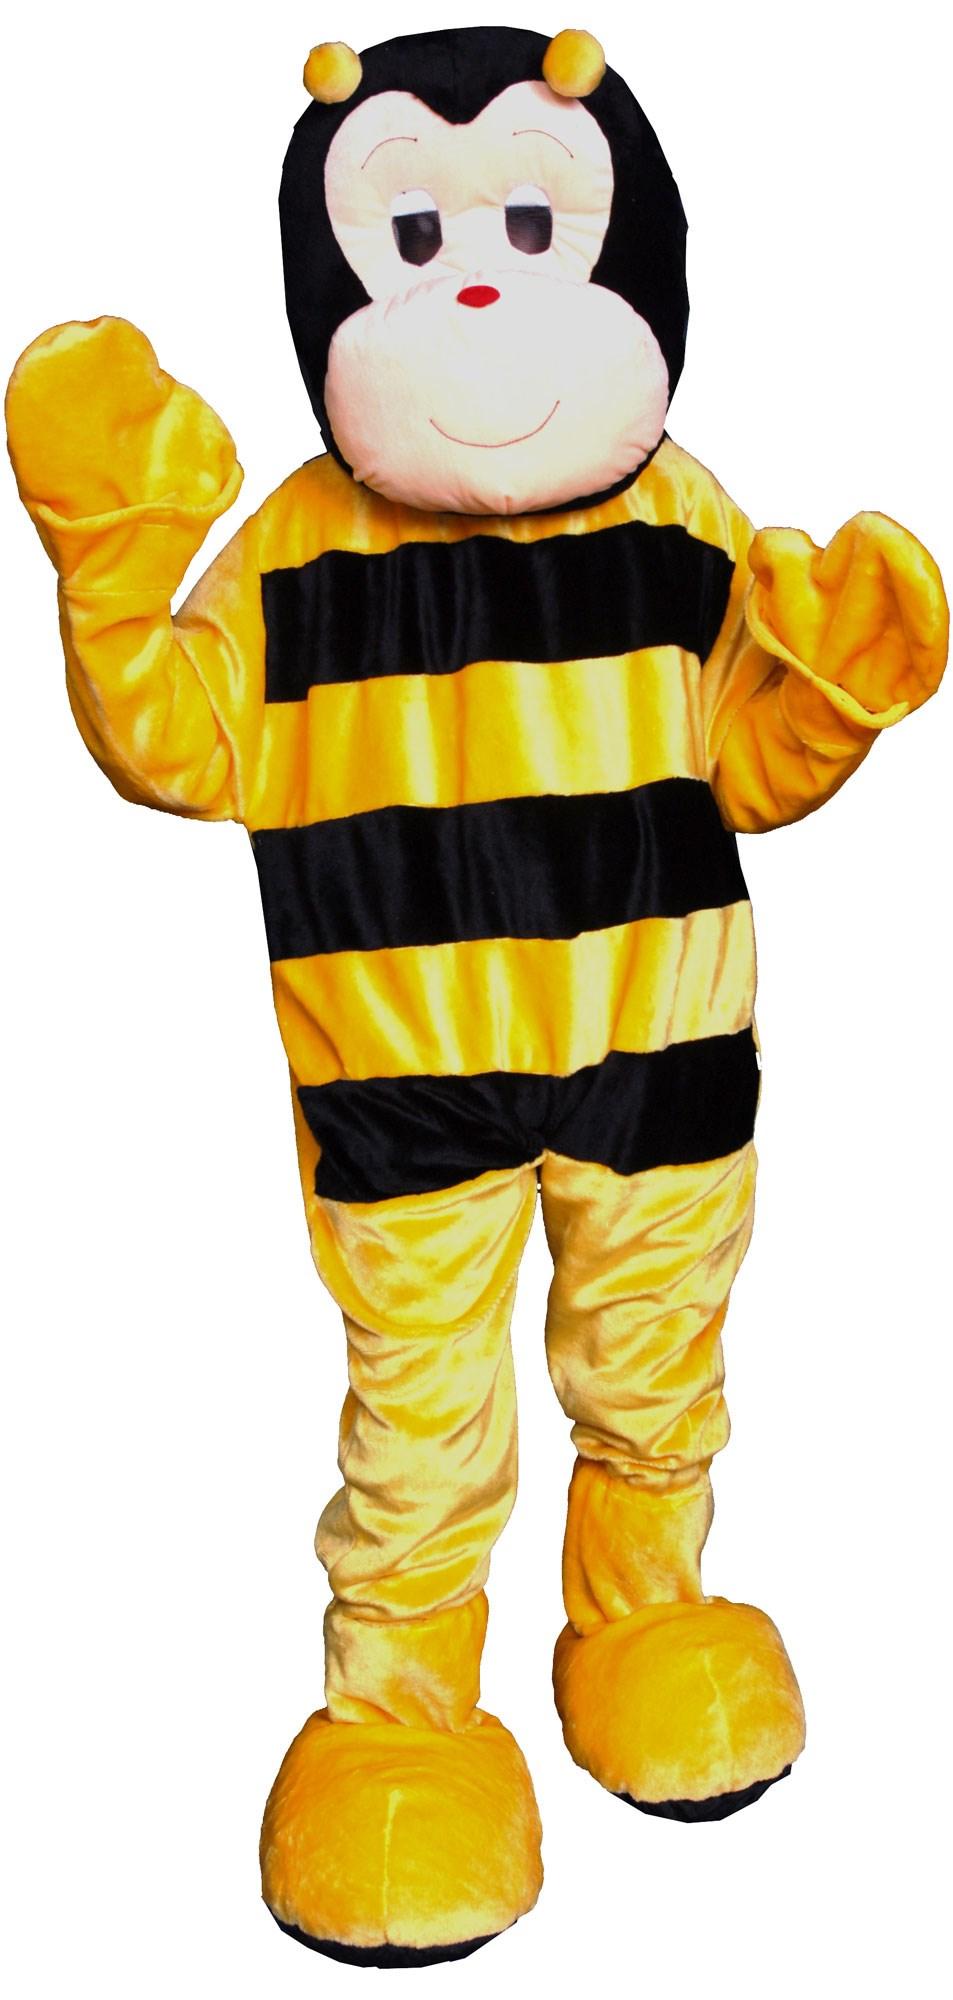 Image of Bumble Bee Economy Mascot Adult Costume